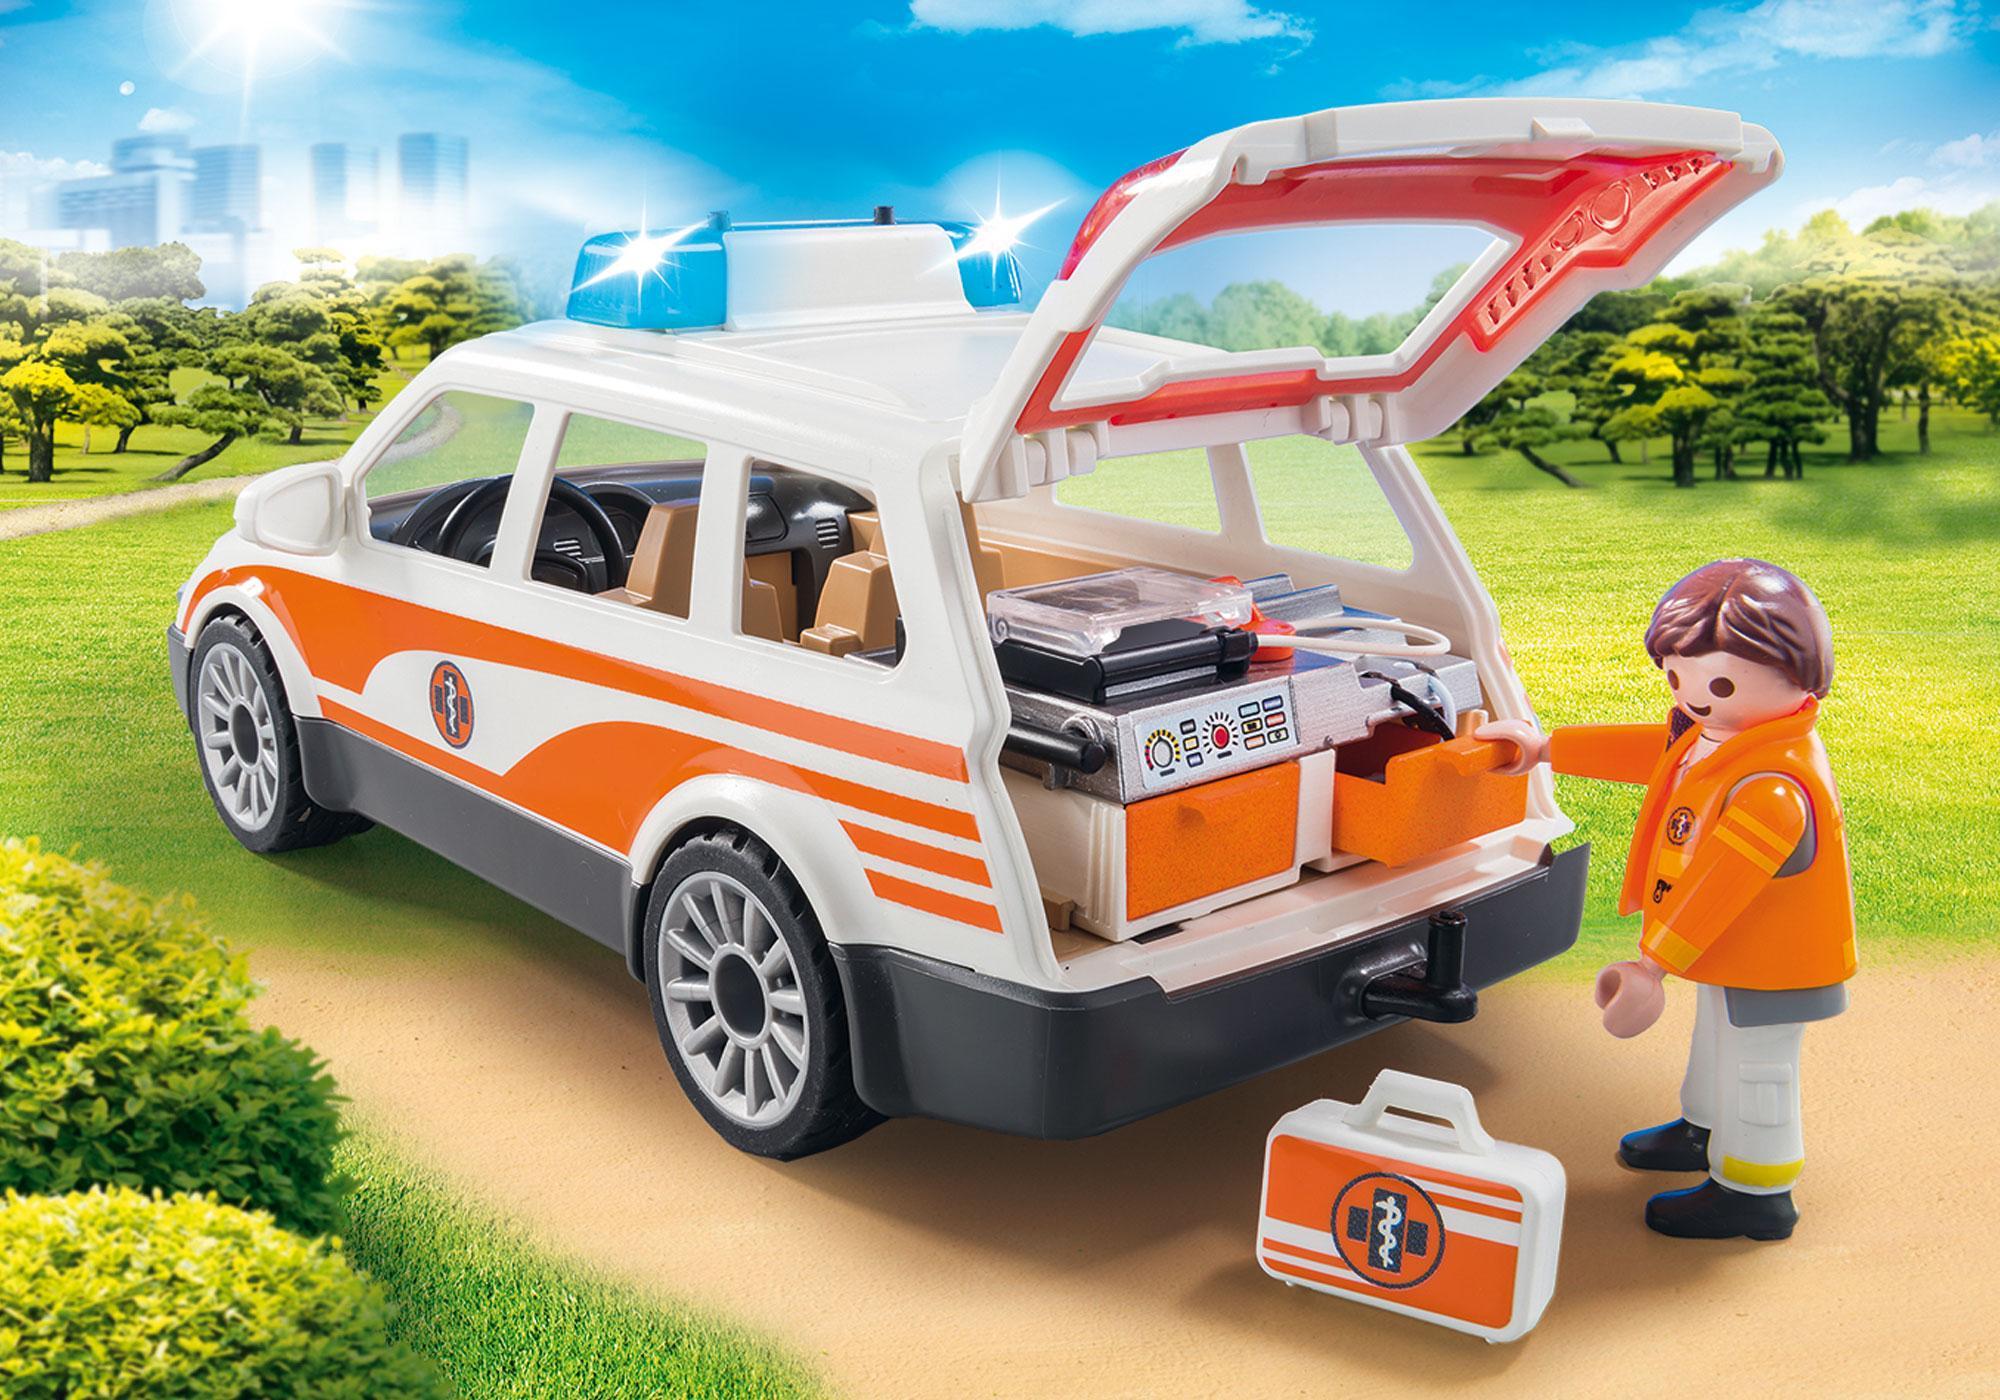 http://media.playmobil.com/i/playmobil/70050_product_extra1/Automedica con sirena